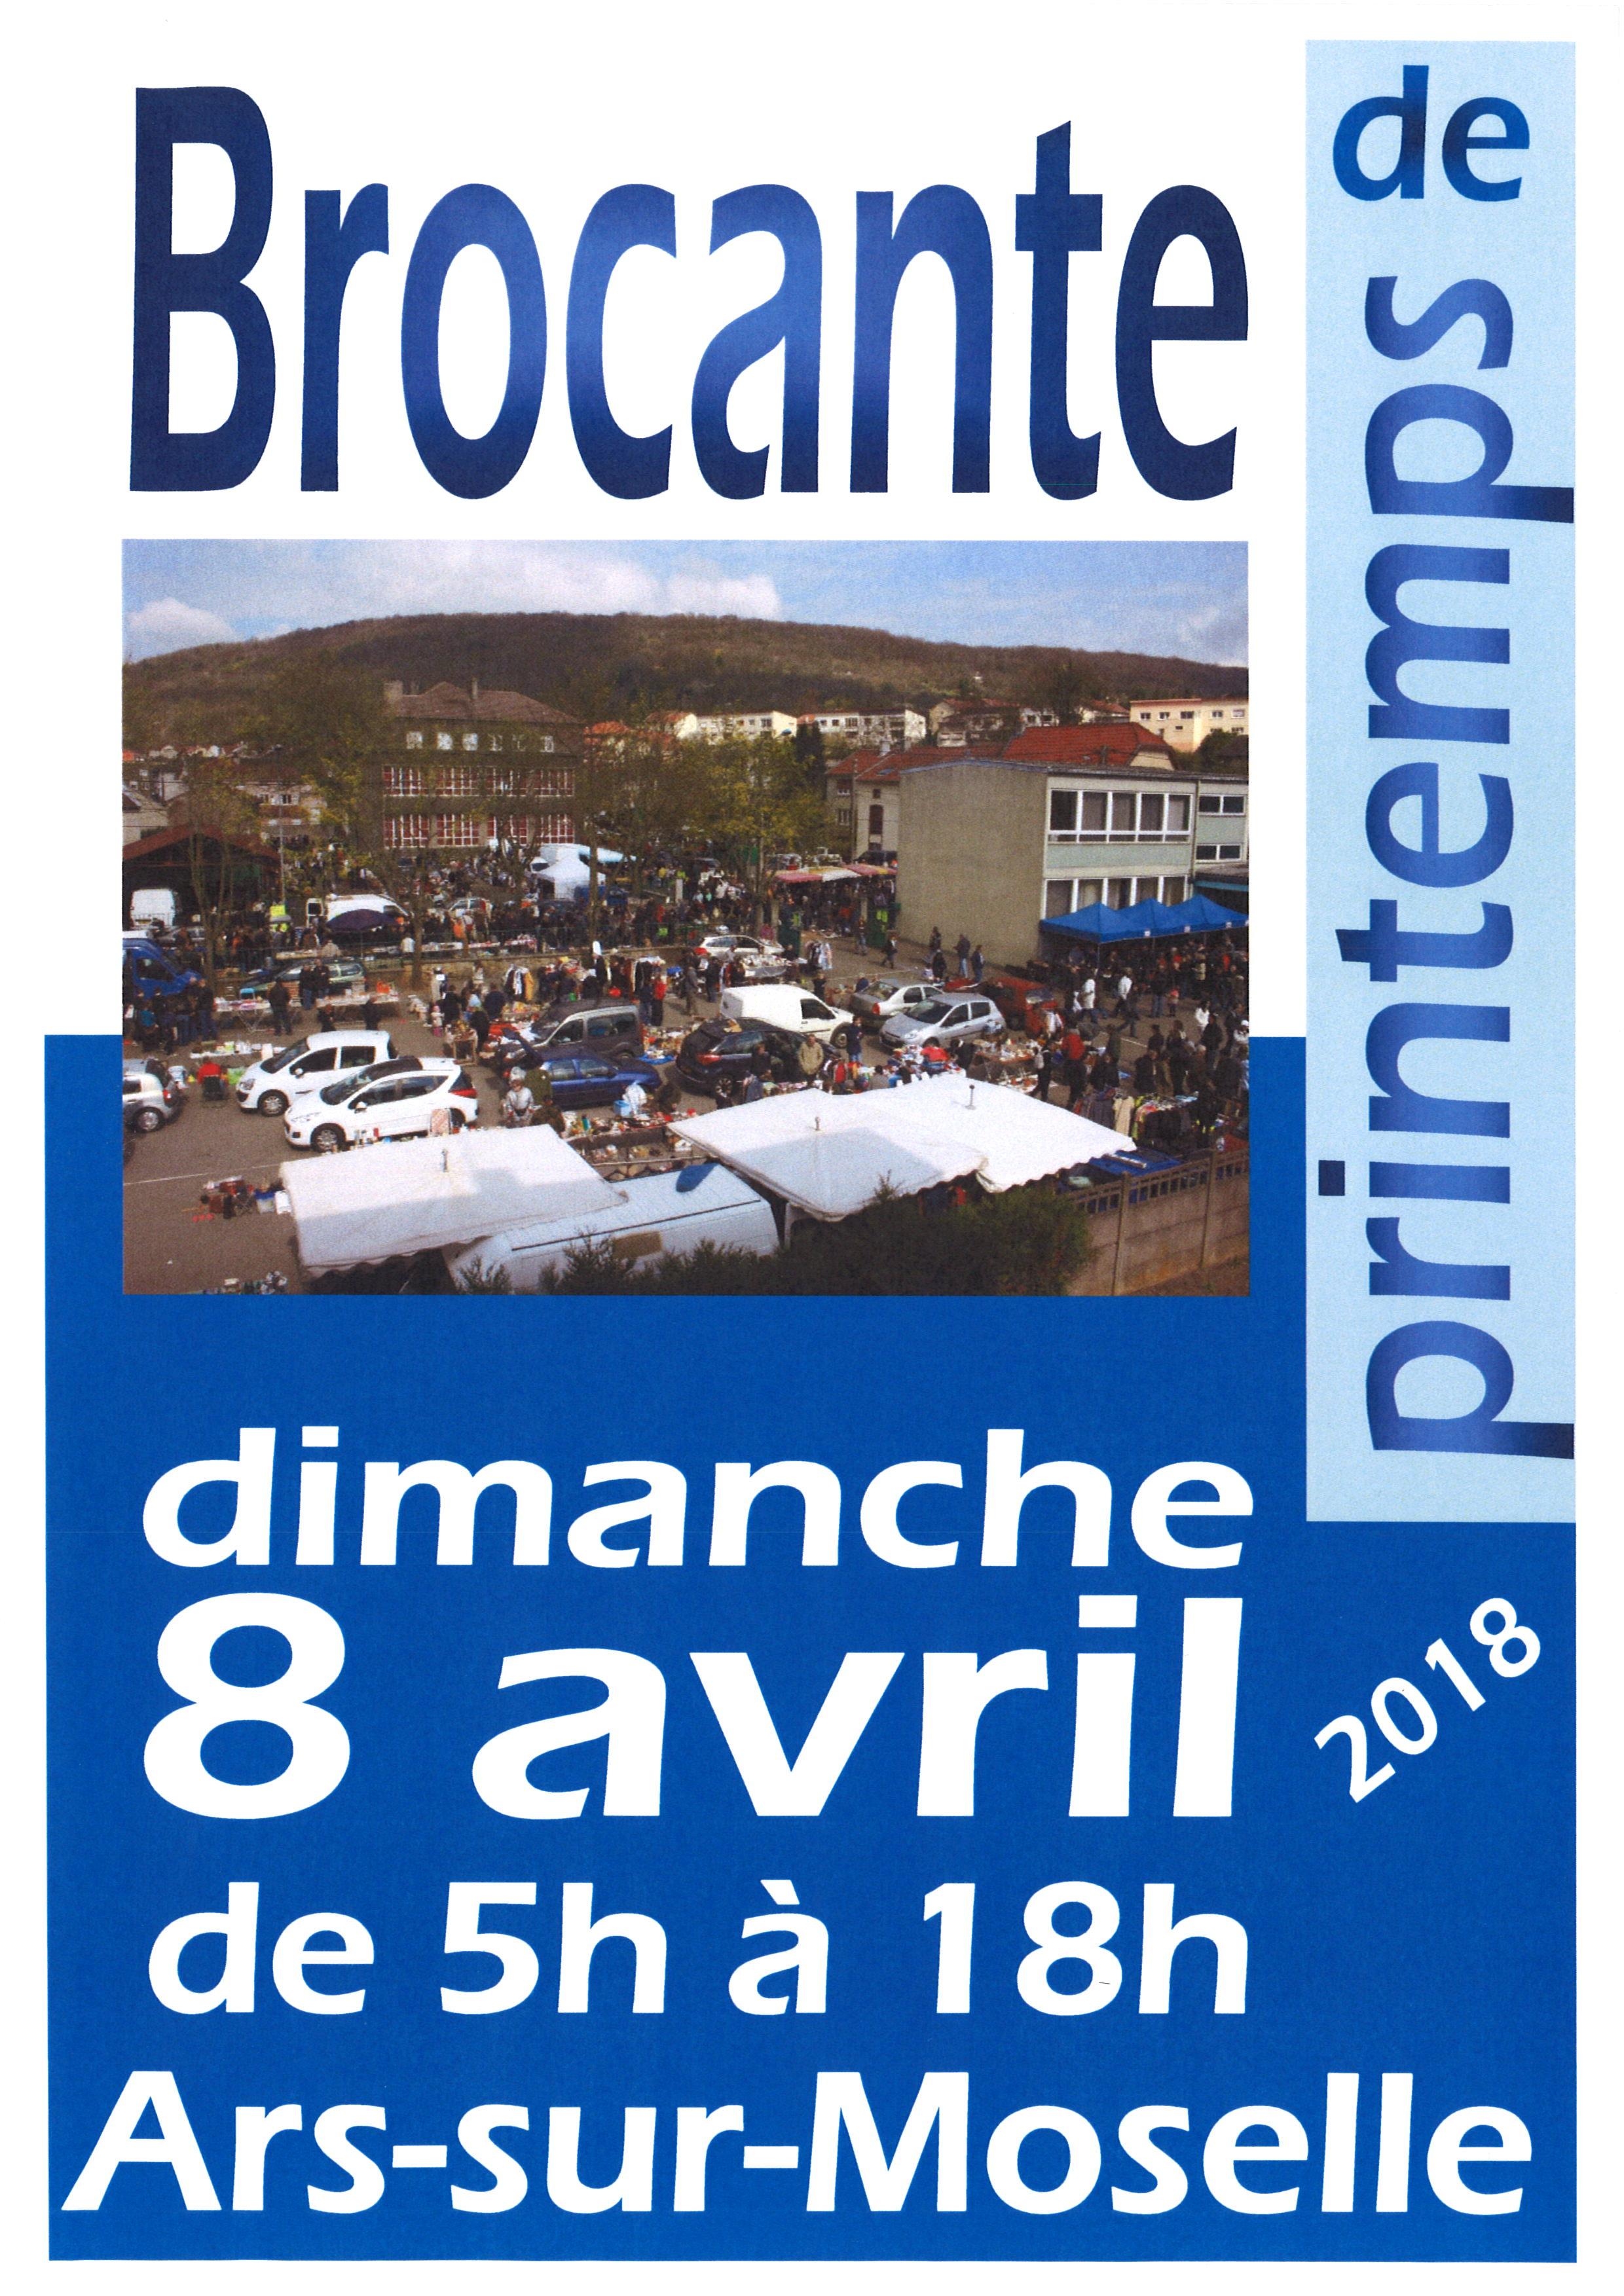 BROCANTE DE PRINTEMPS dimanche 8 avril